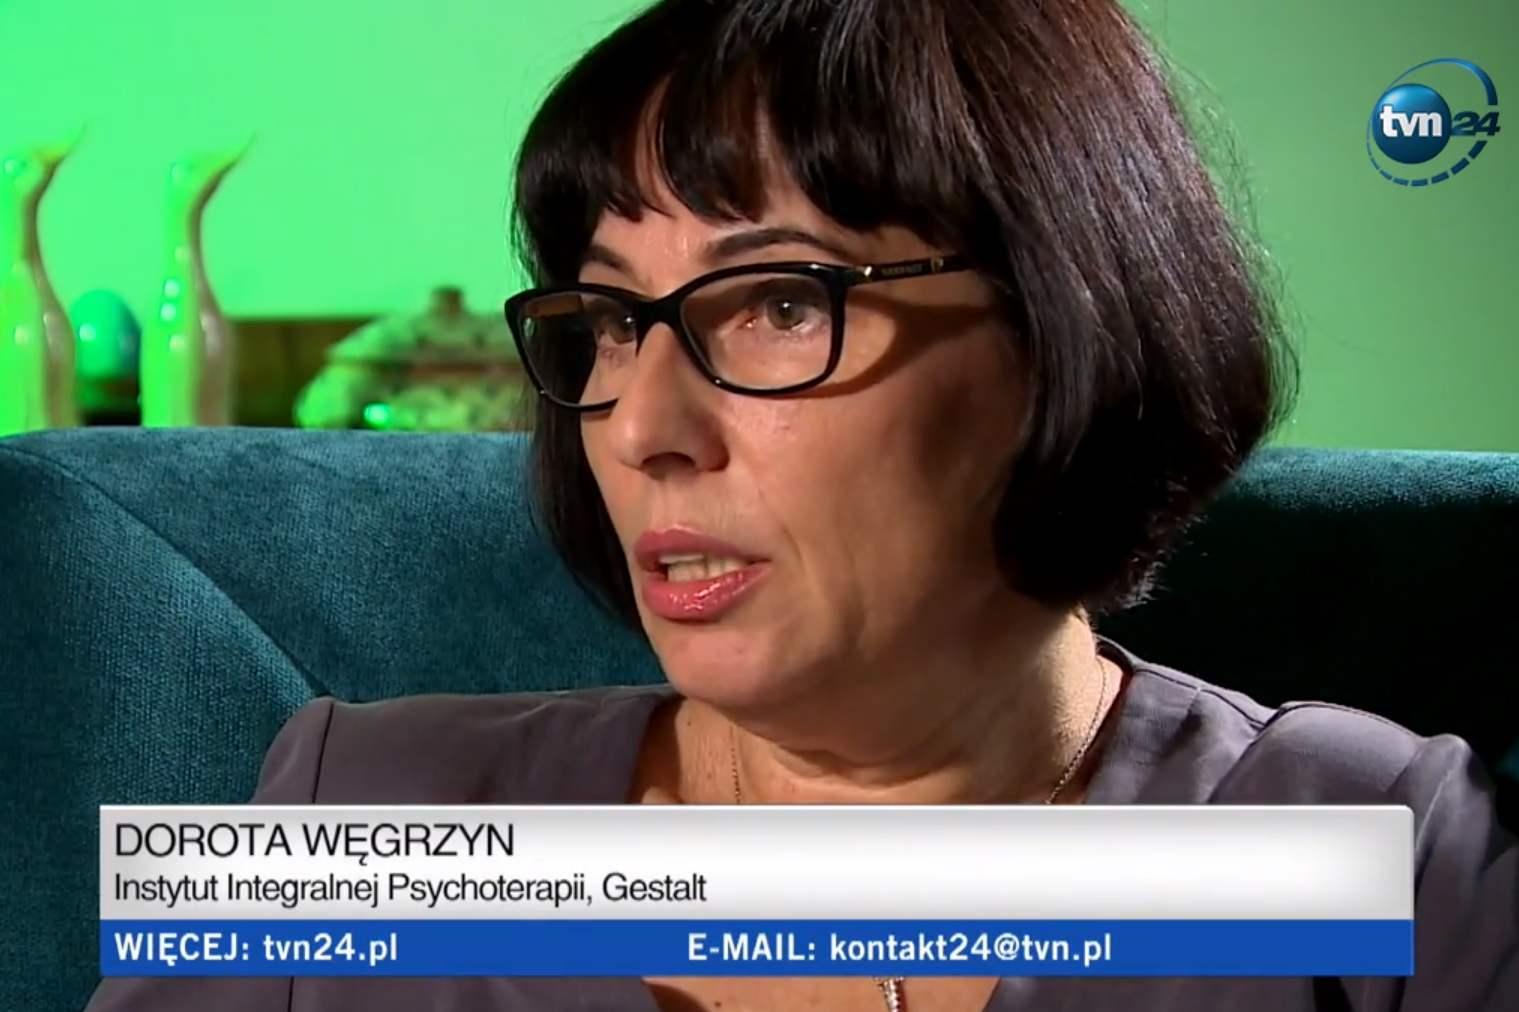 Dorota Węgrzyn i prof. Bogdan de Barbaro w TVN24